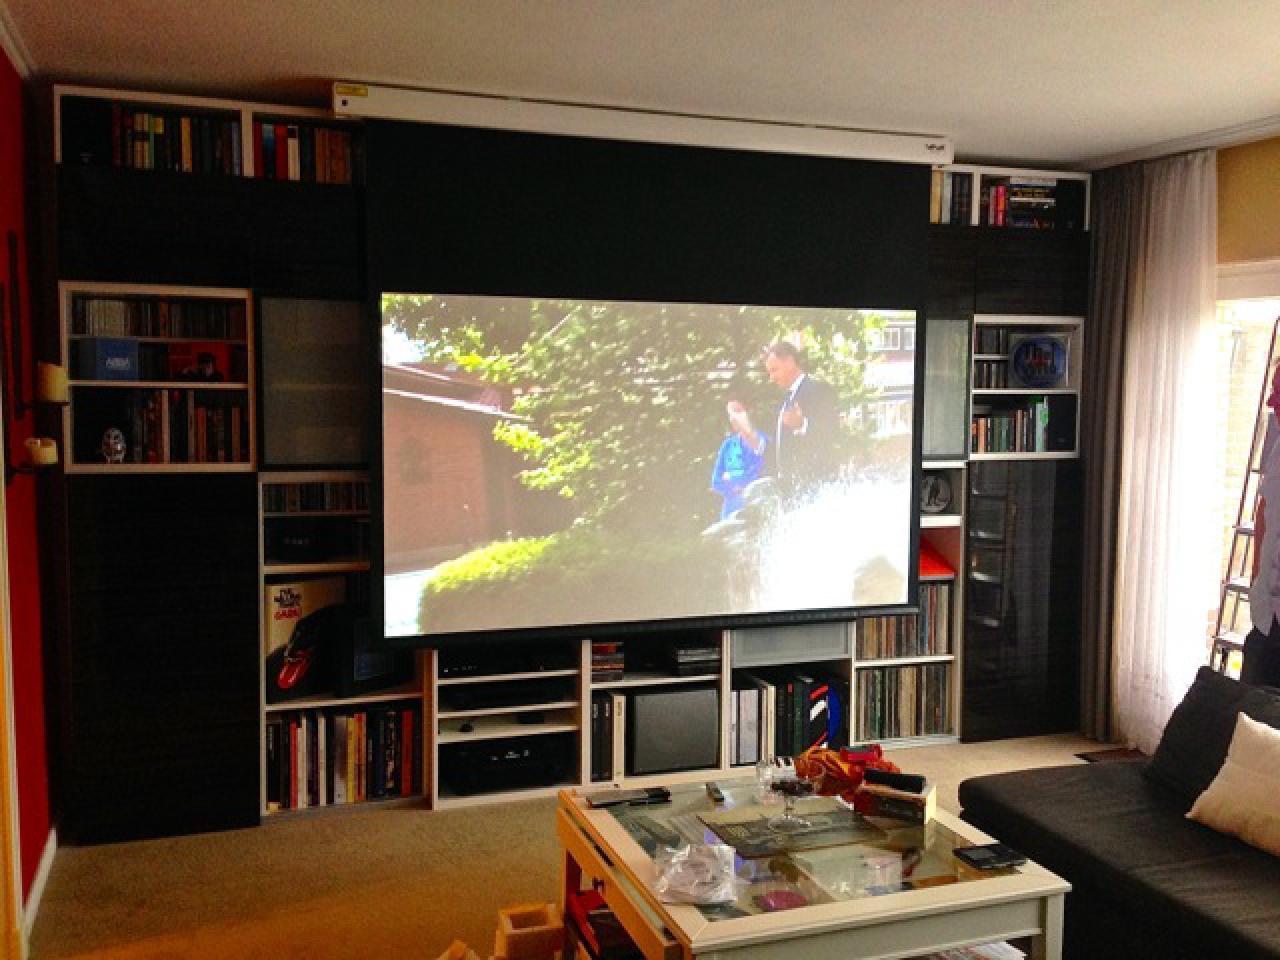 heimkino do it yourself heimkino selbst bauen. Black Bedroom Furniture Sets. Home Design Ideas